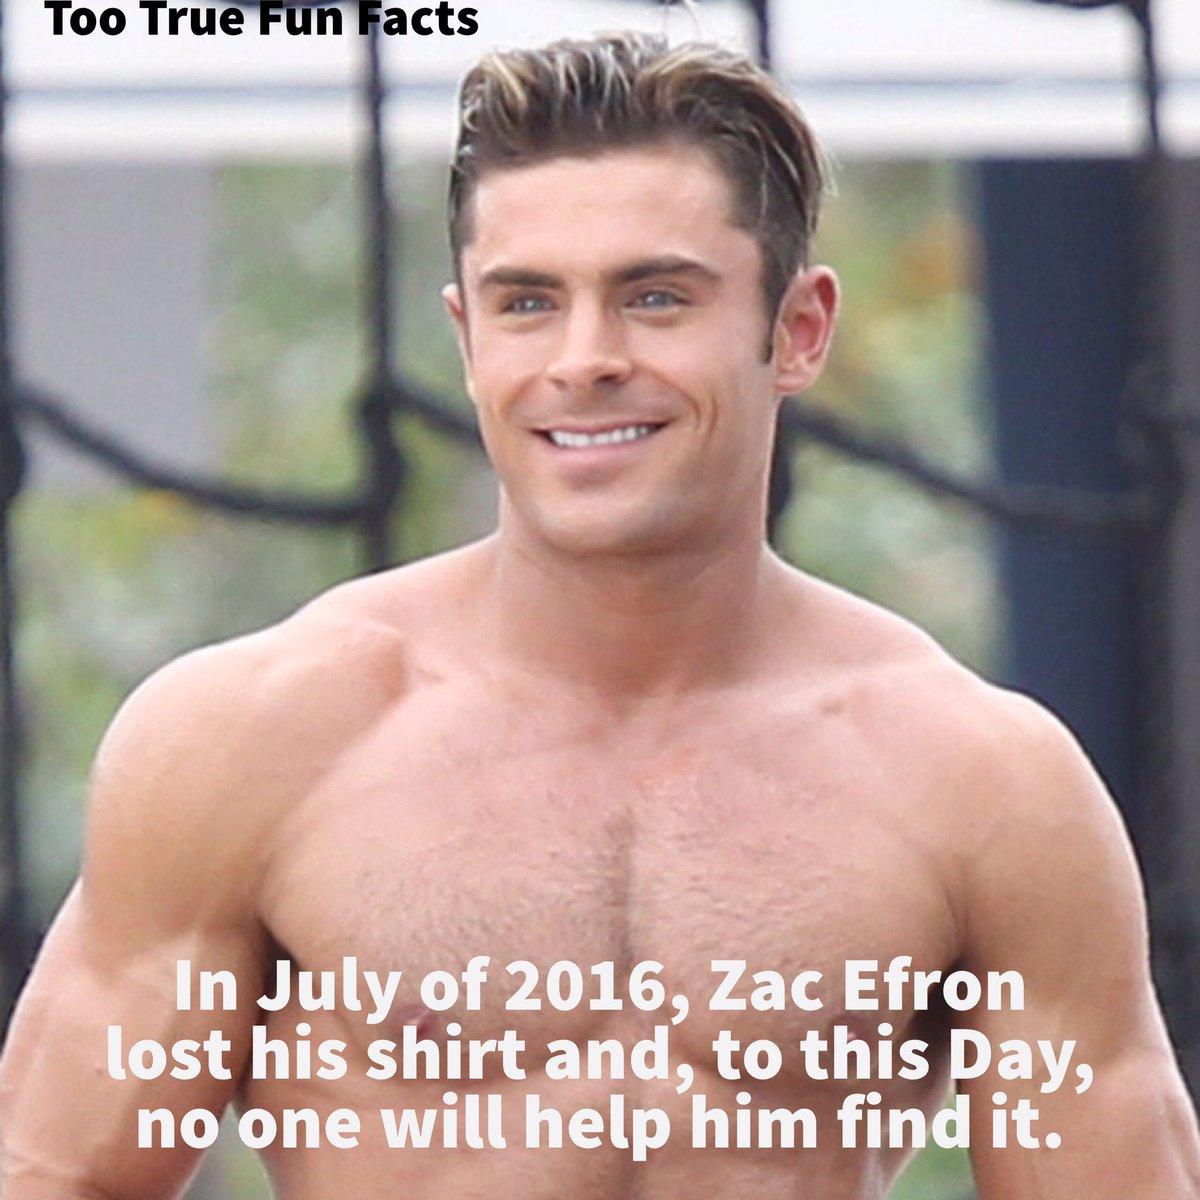 Celebrity Fun Fact. #zacefron #actors #actor #actorslife #disneychannel #shirt #shirtless #comedy #funny #meme #memes #parody #satire #lol<br>http://pic.twitter.com/84G3LwDvZC